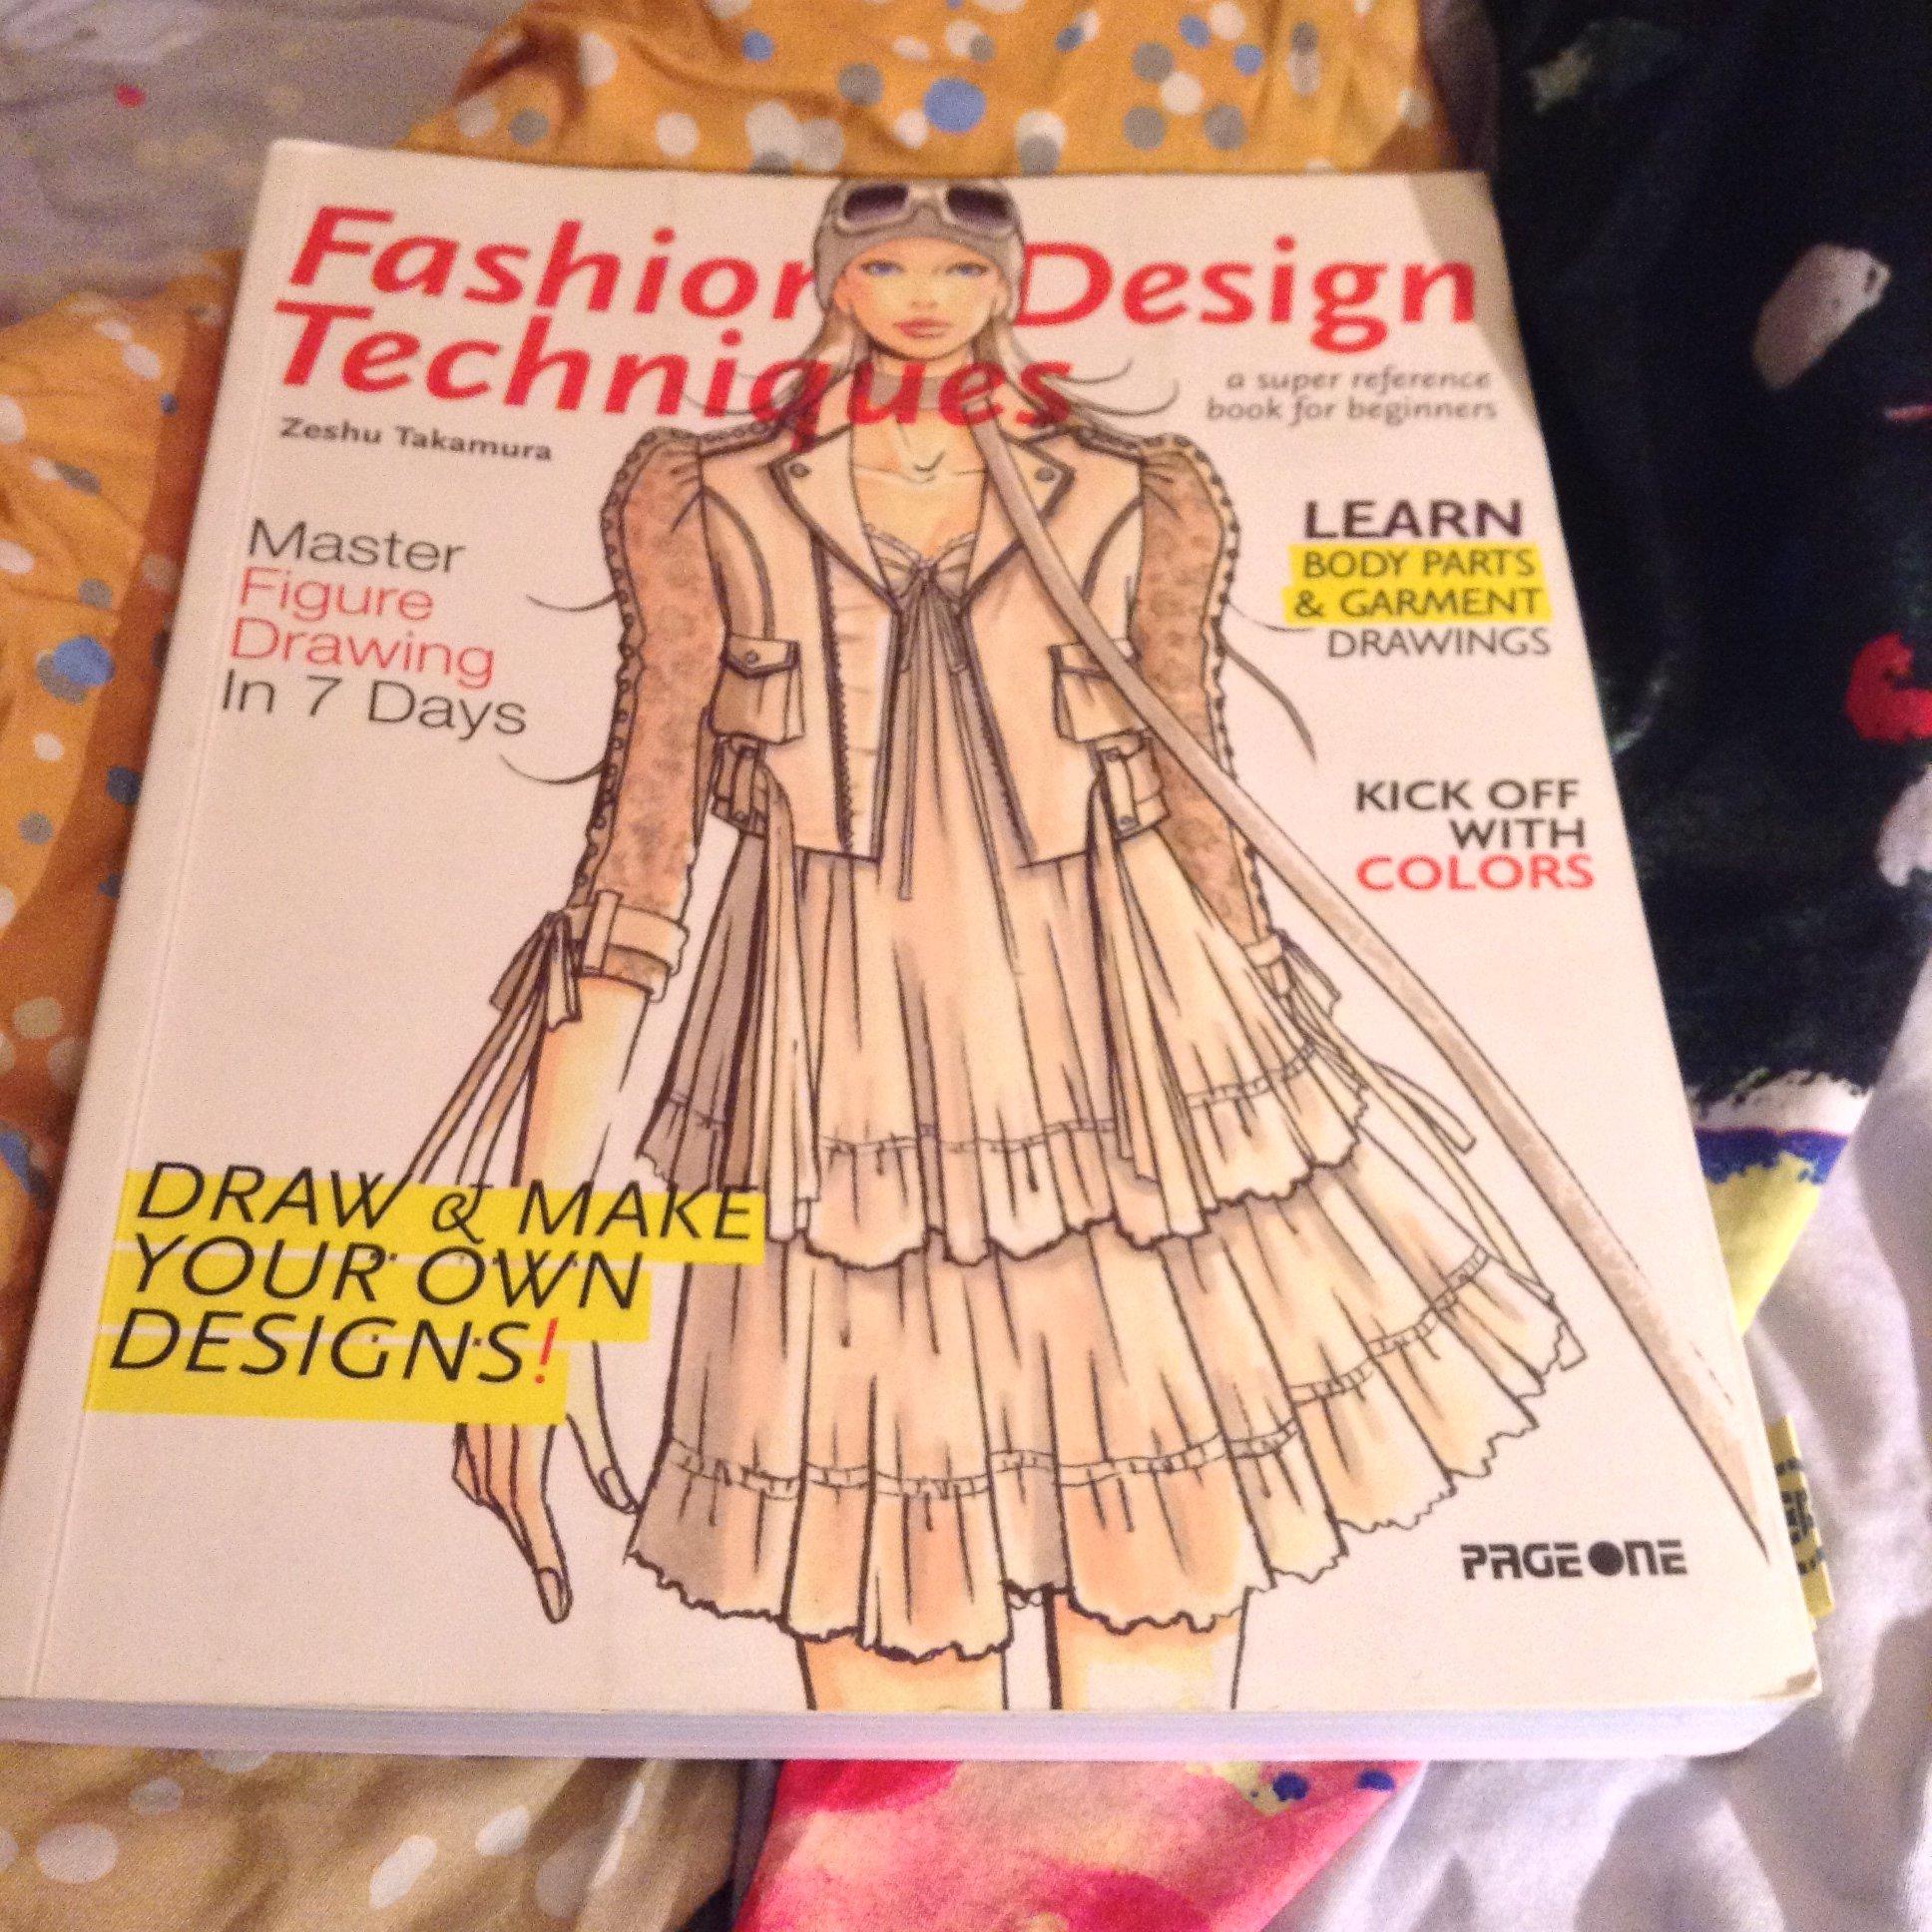 Fashion Design Technique A Super Reference Book For Beginners Amazon Co Uk Books